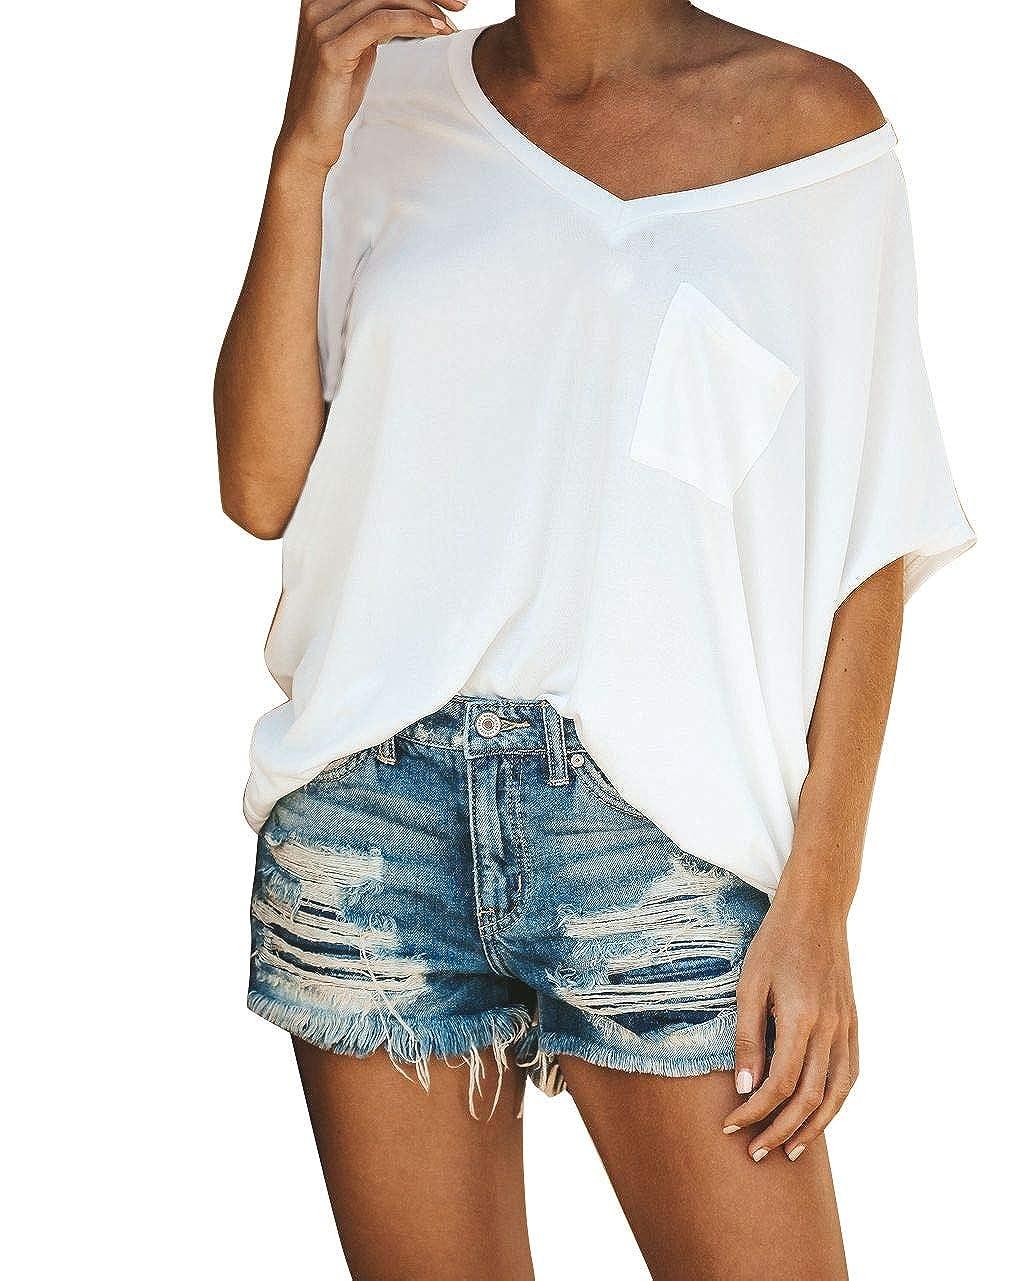 Slowly Damen Casual V-Ausschnitt Kurzarm T-Shirt Tasche Rundhals Top T Shirt Bluse Tops Mit Tasche